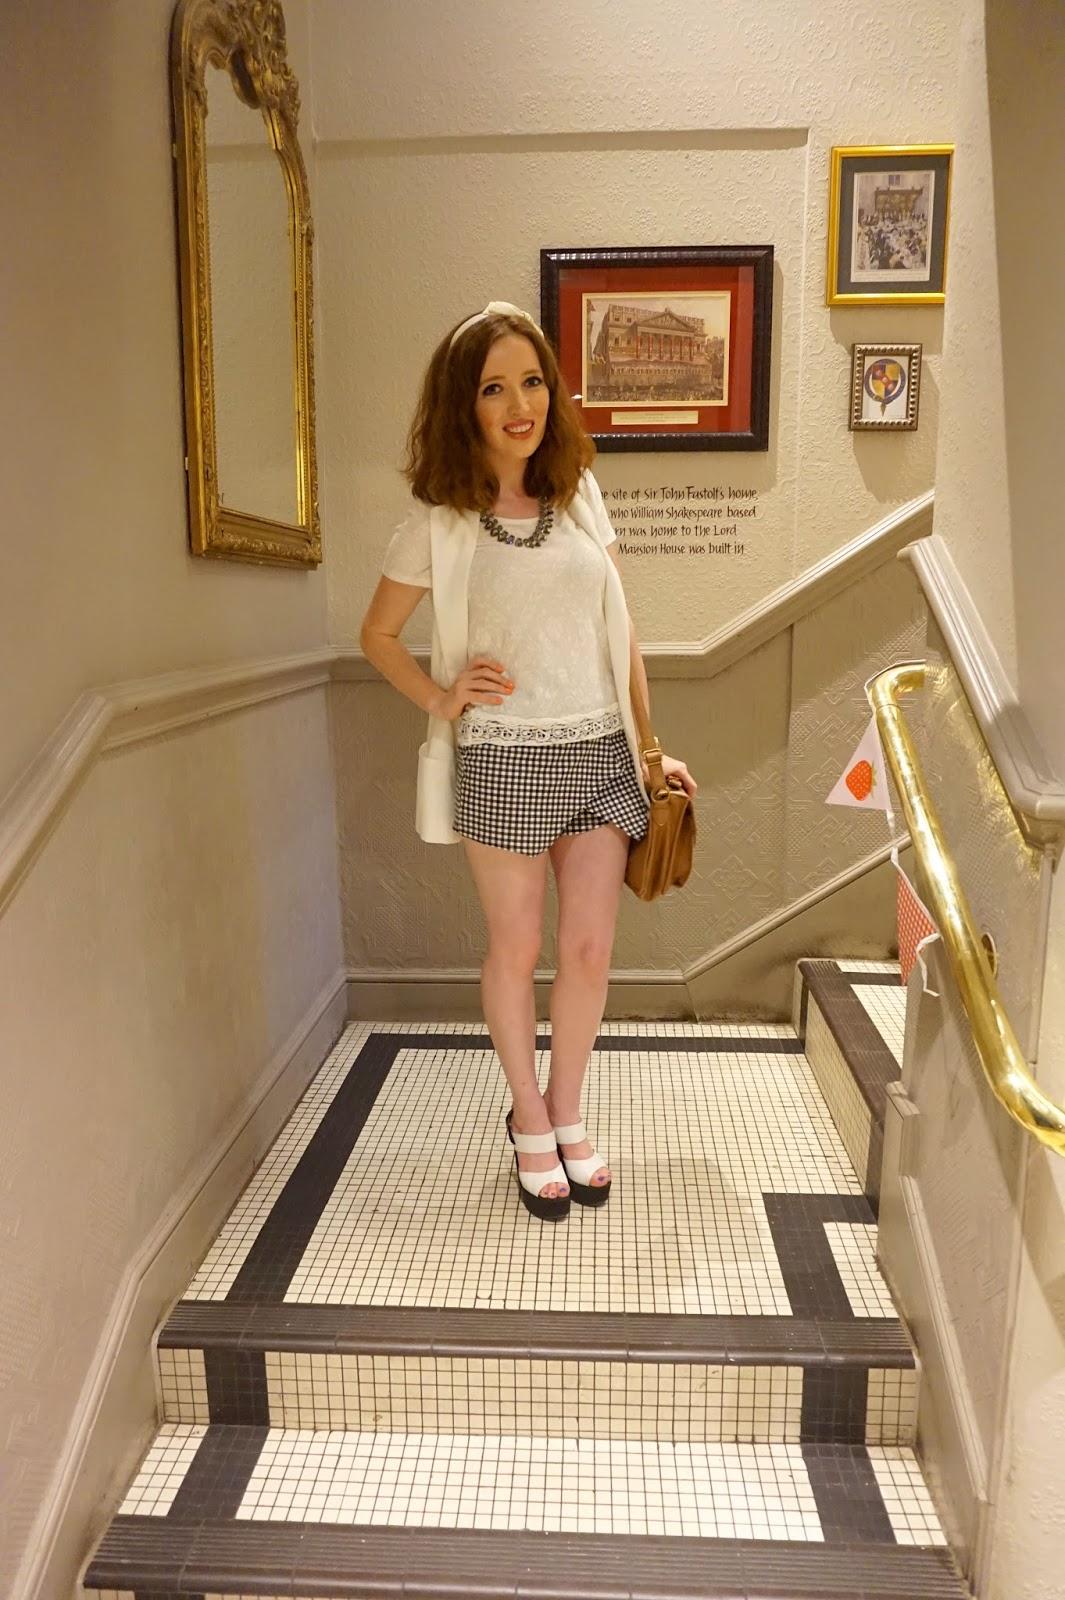 bec boop wimbledon fashion outfit